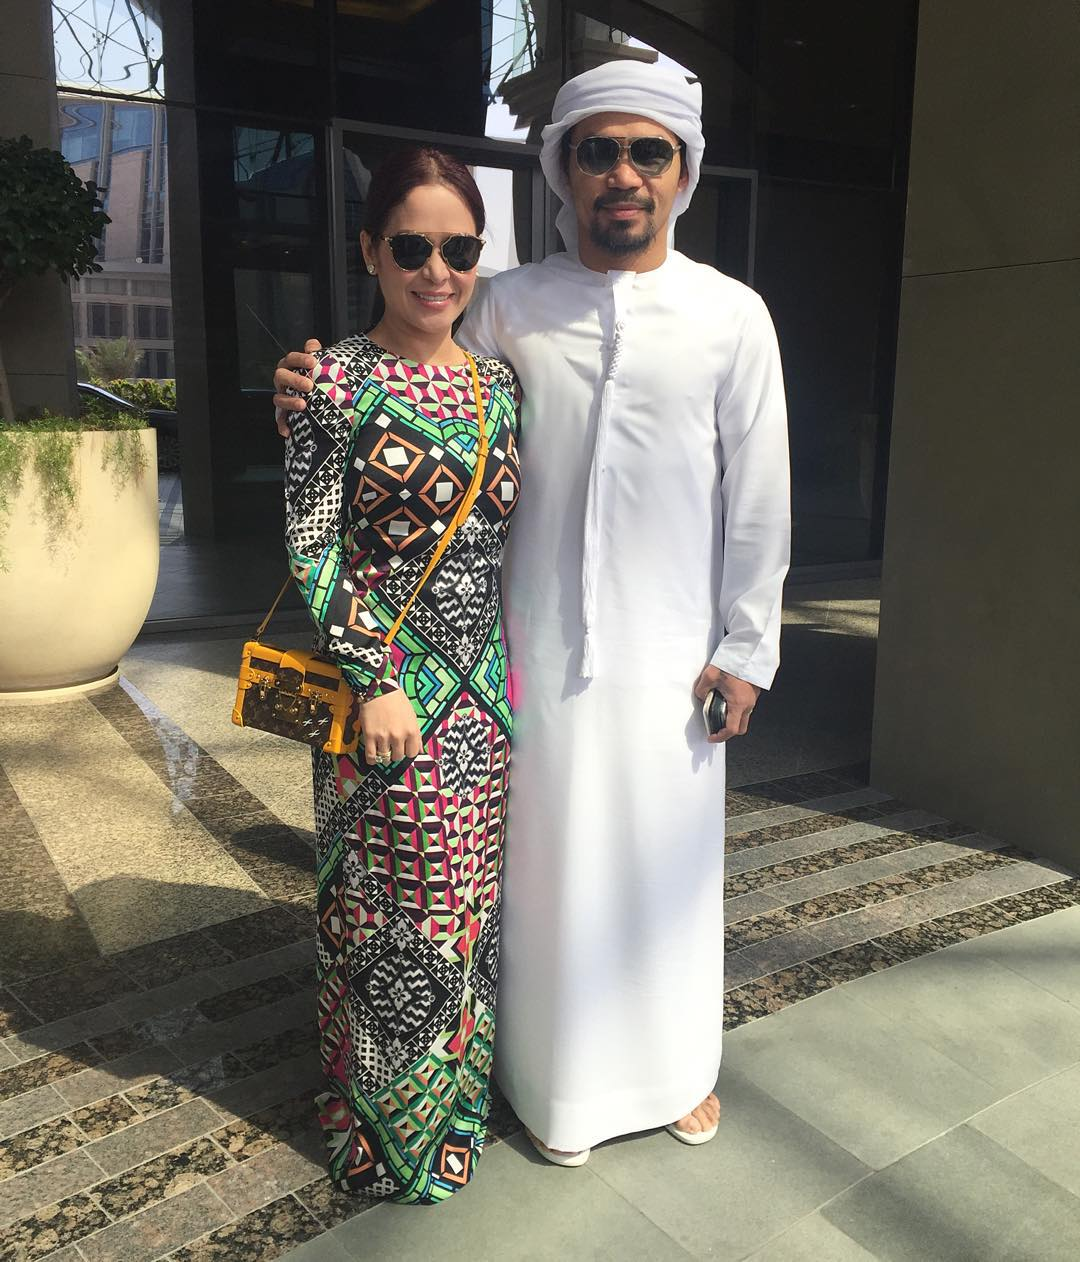 Manny-Pacquiao-wears-traditional-Arabian-clothing-photo